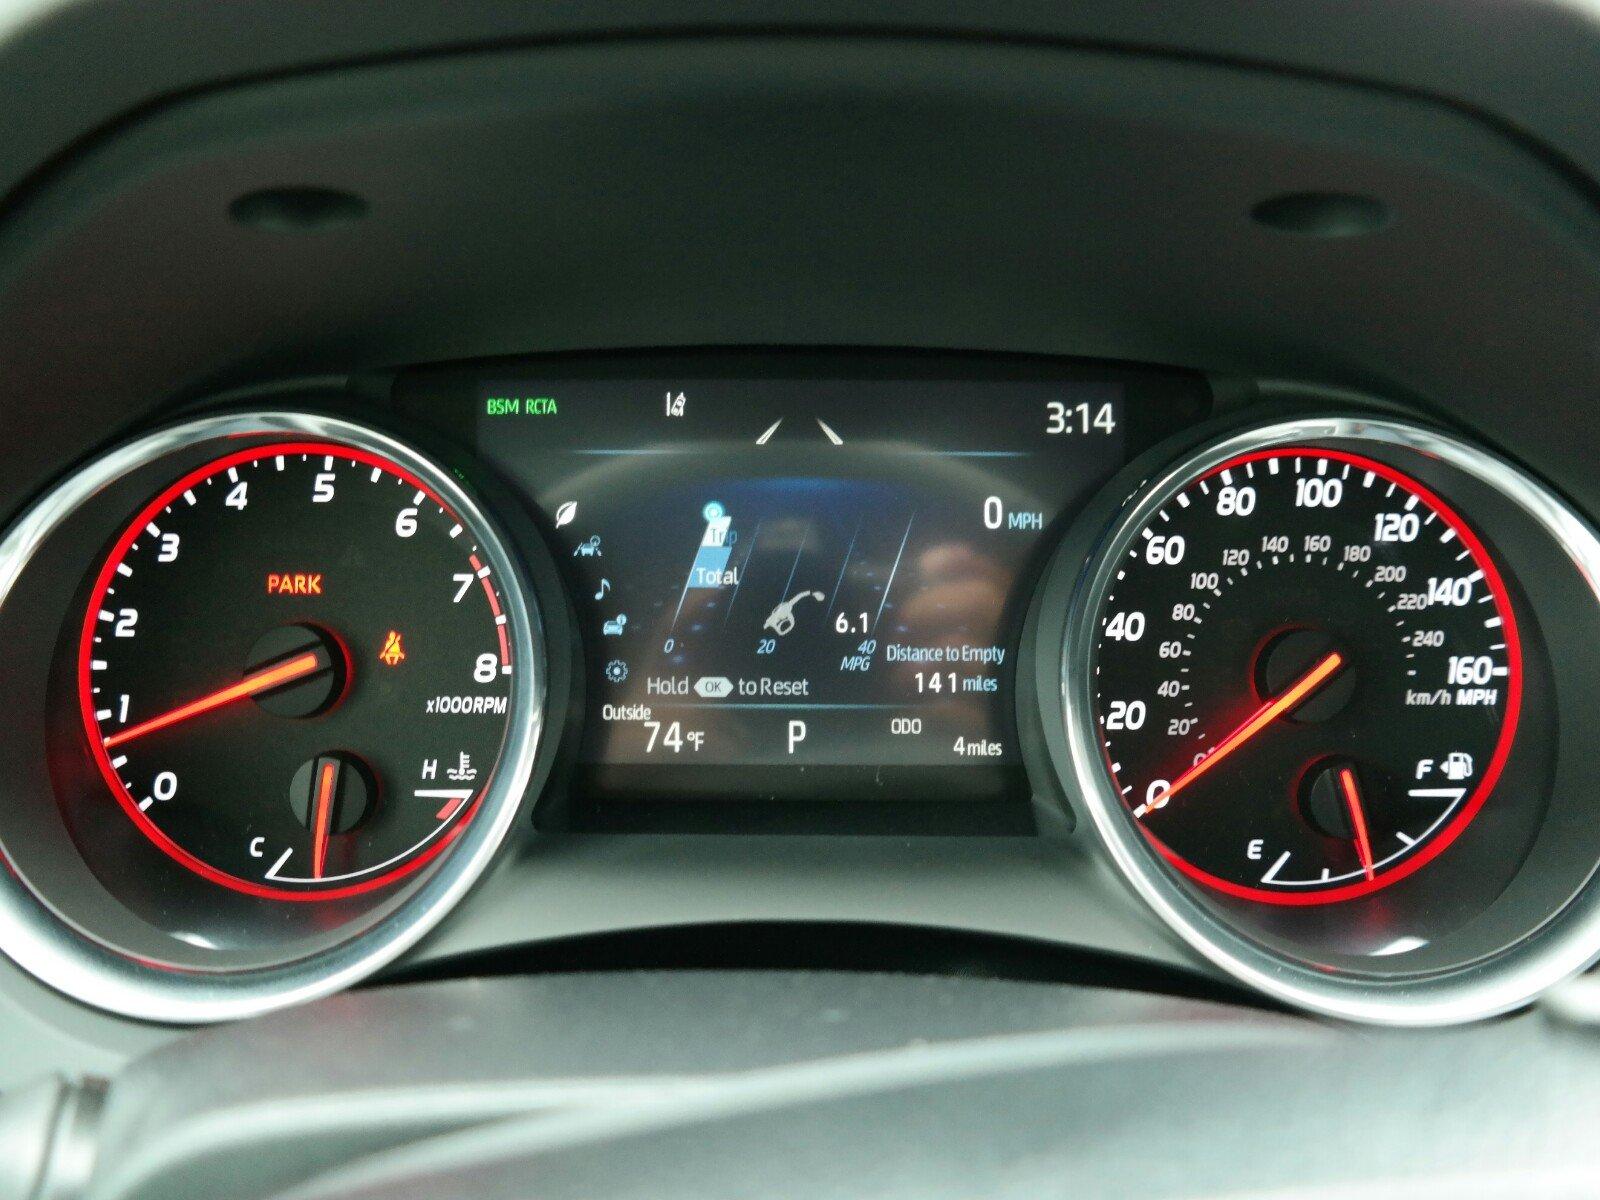 Car Hesitates At 40 Mph